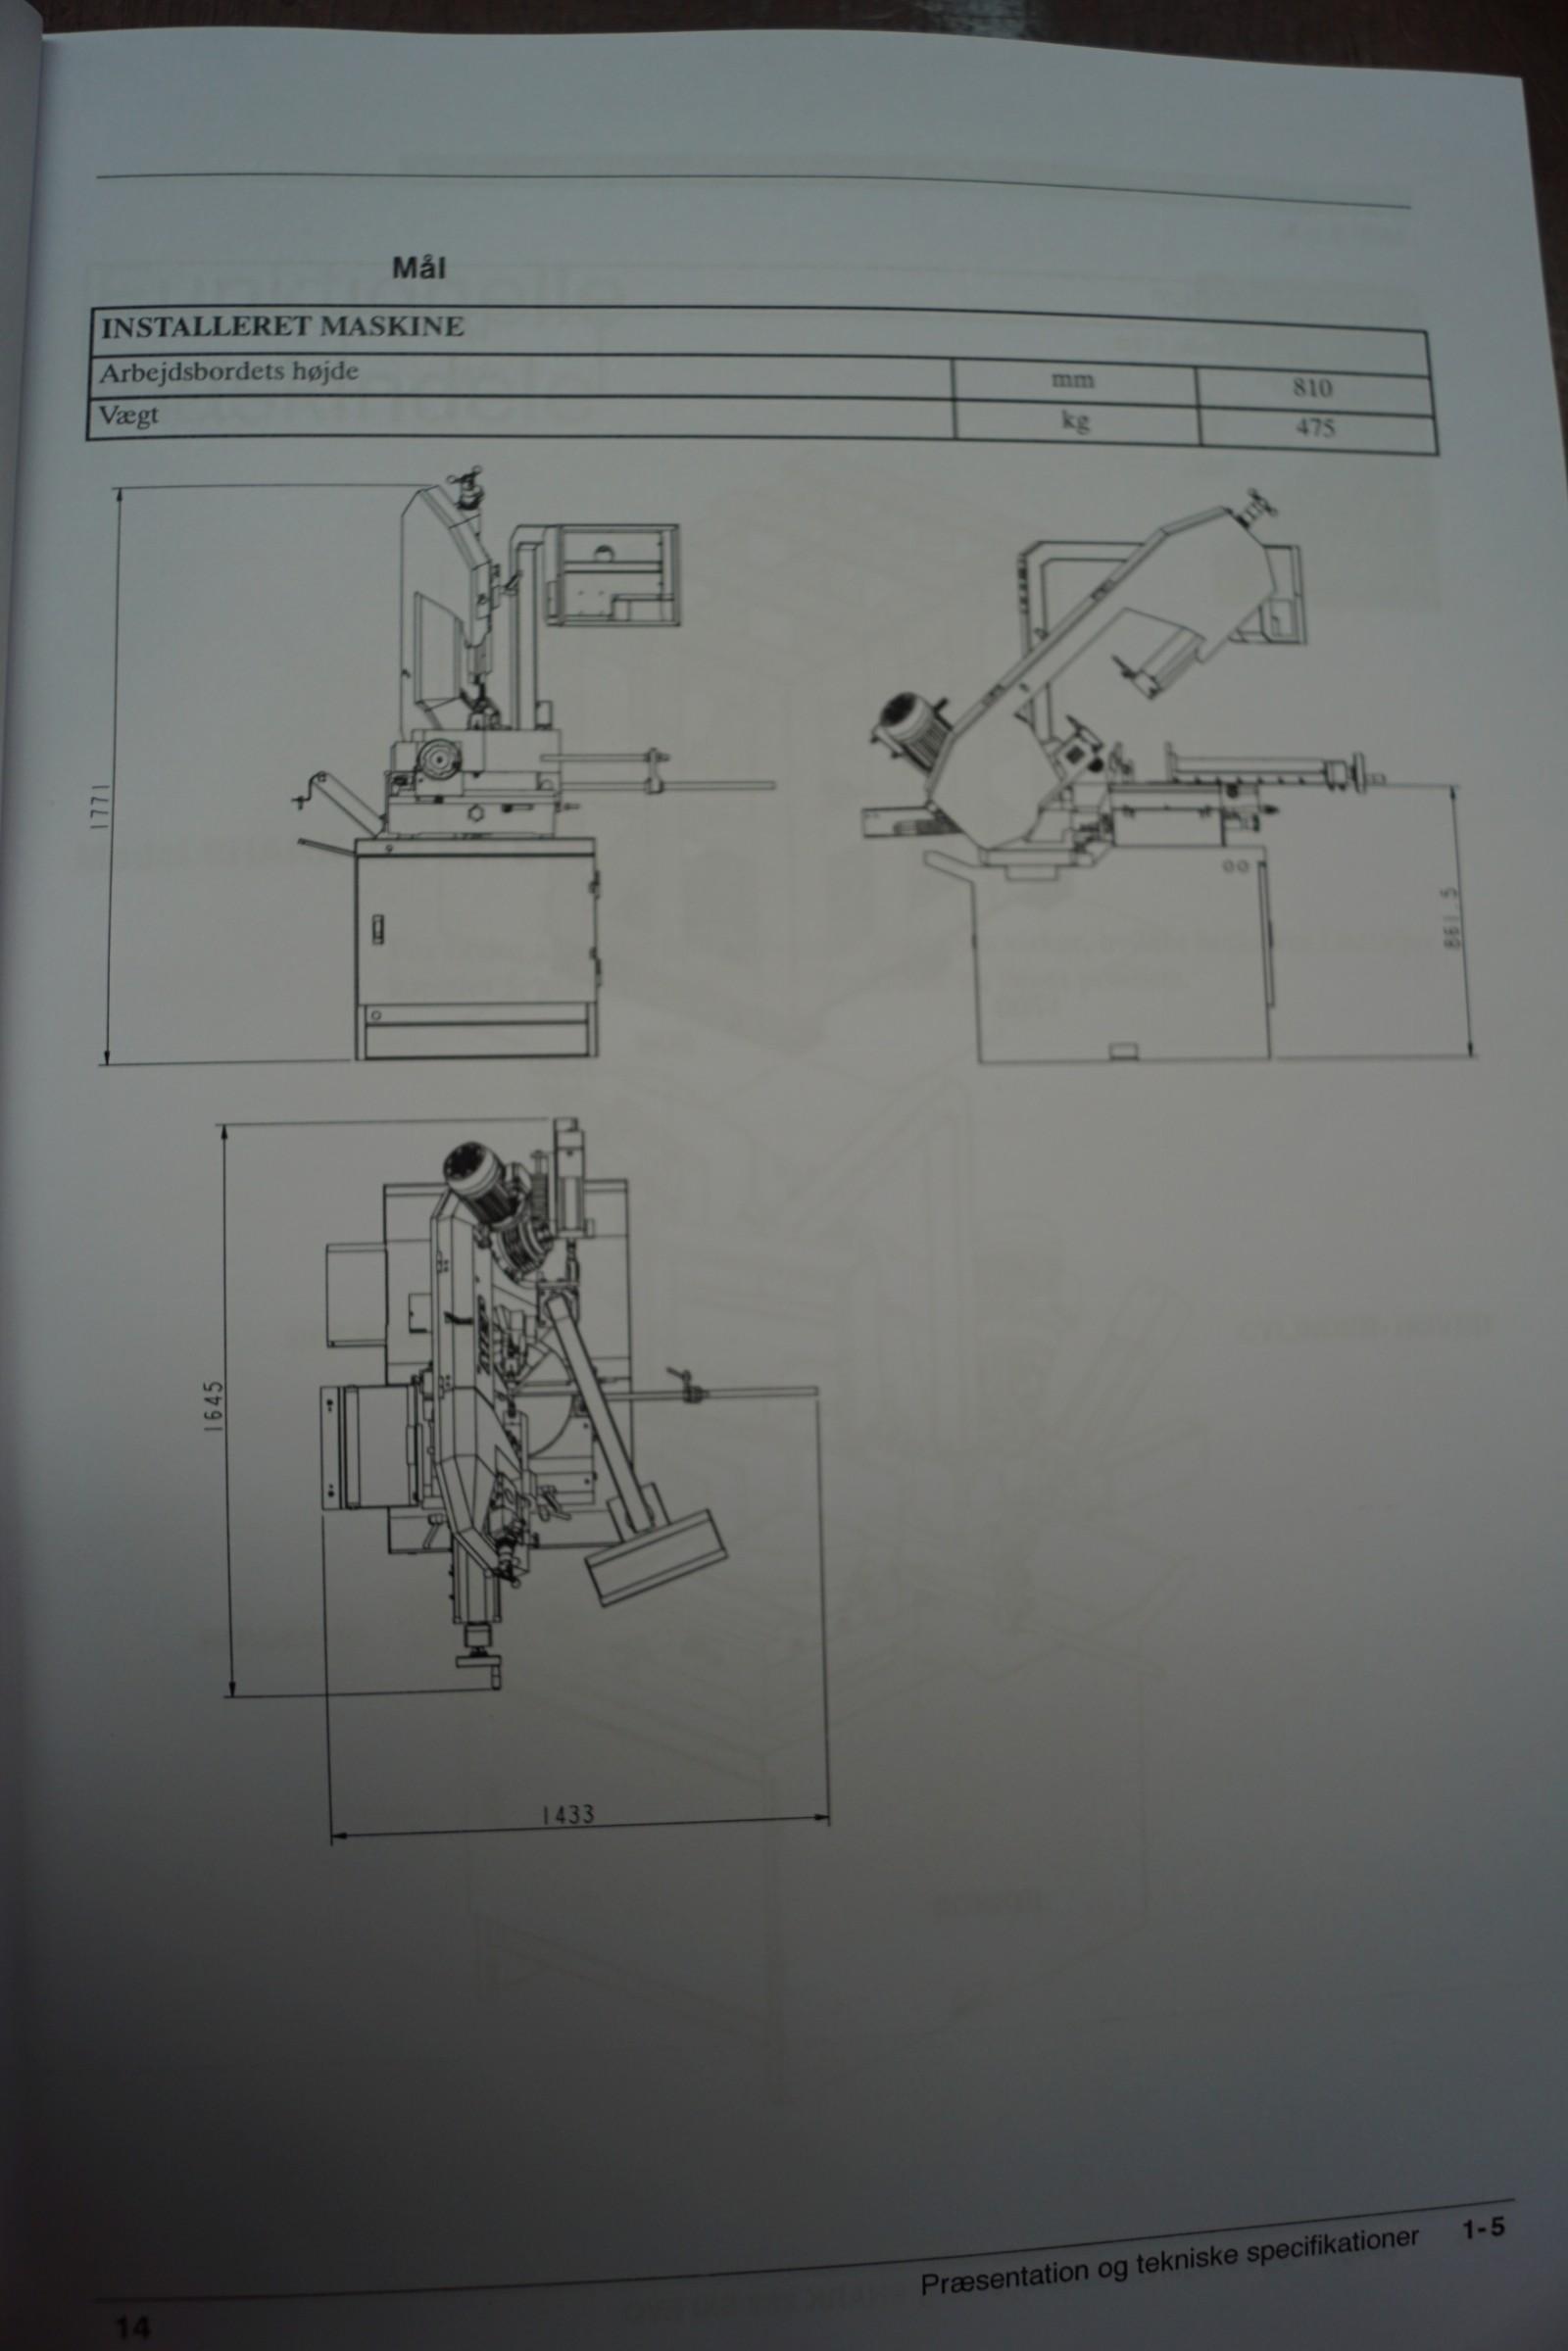 Fully Automatic Belt Saw Mrk Shark 282 Sxi Evo Years 2018 Kj 0413 Rocker Switch Wiring Diagram